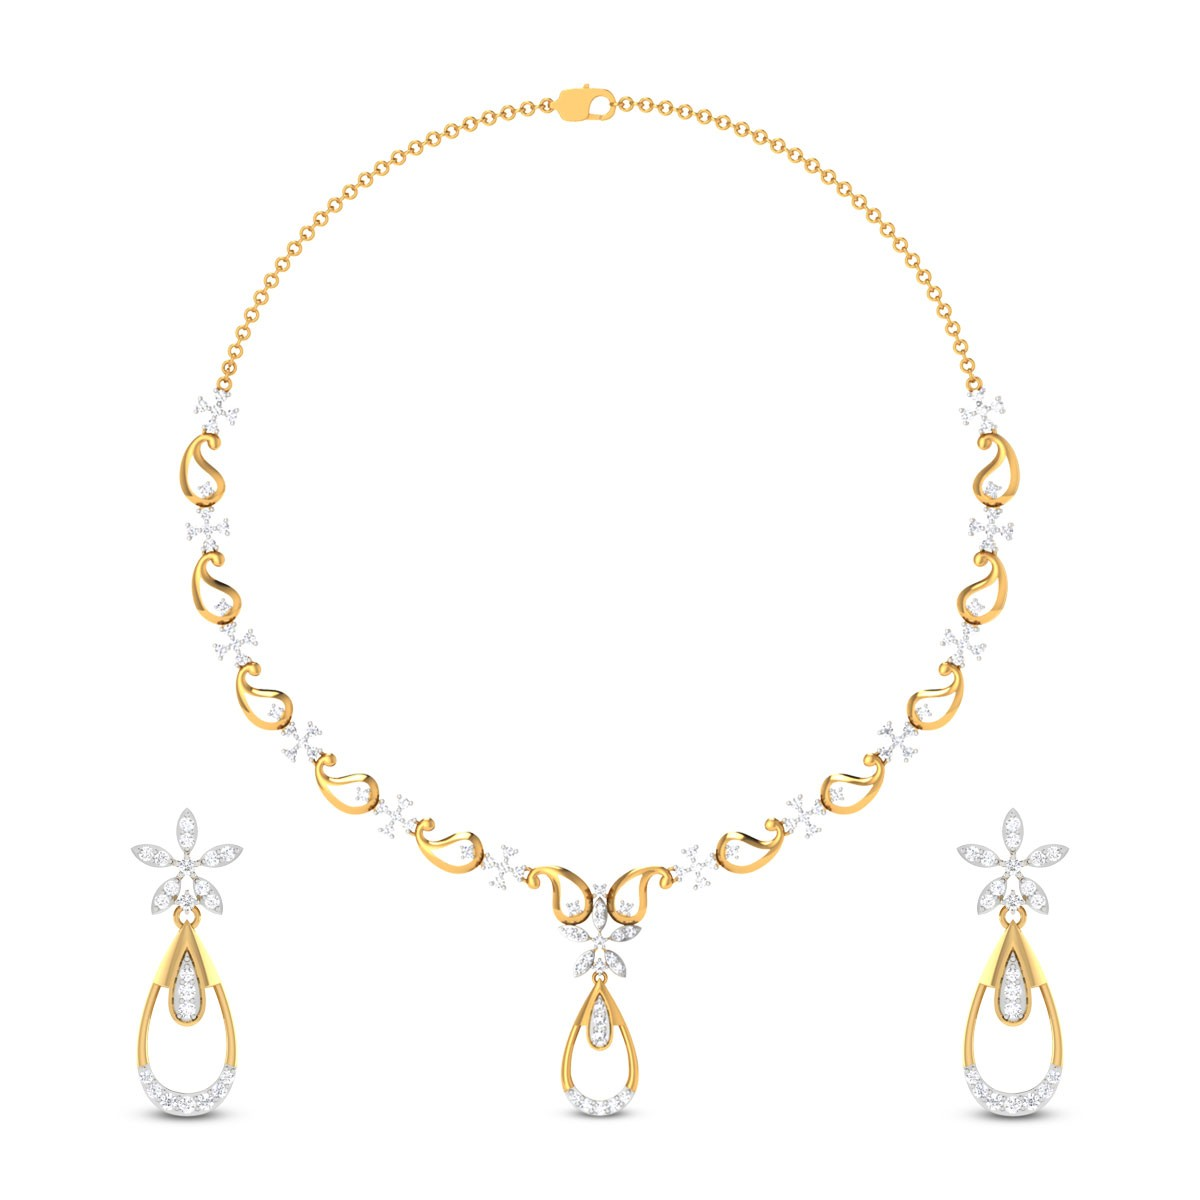 Sparkling Floral Diamond Necklace Set